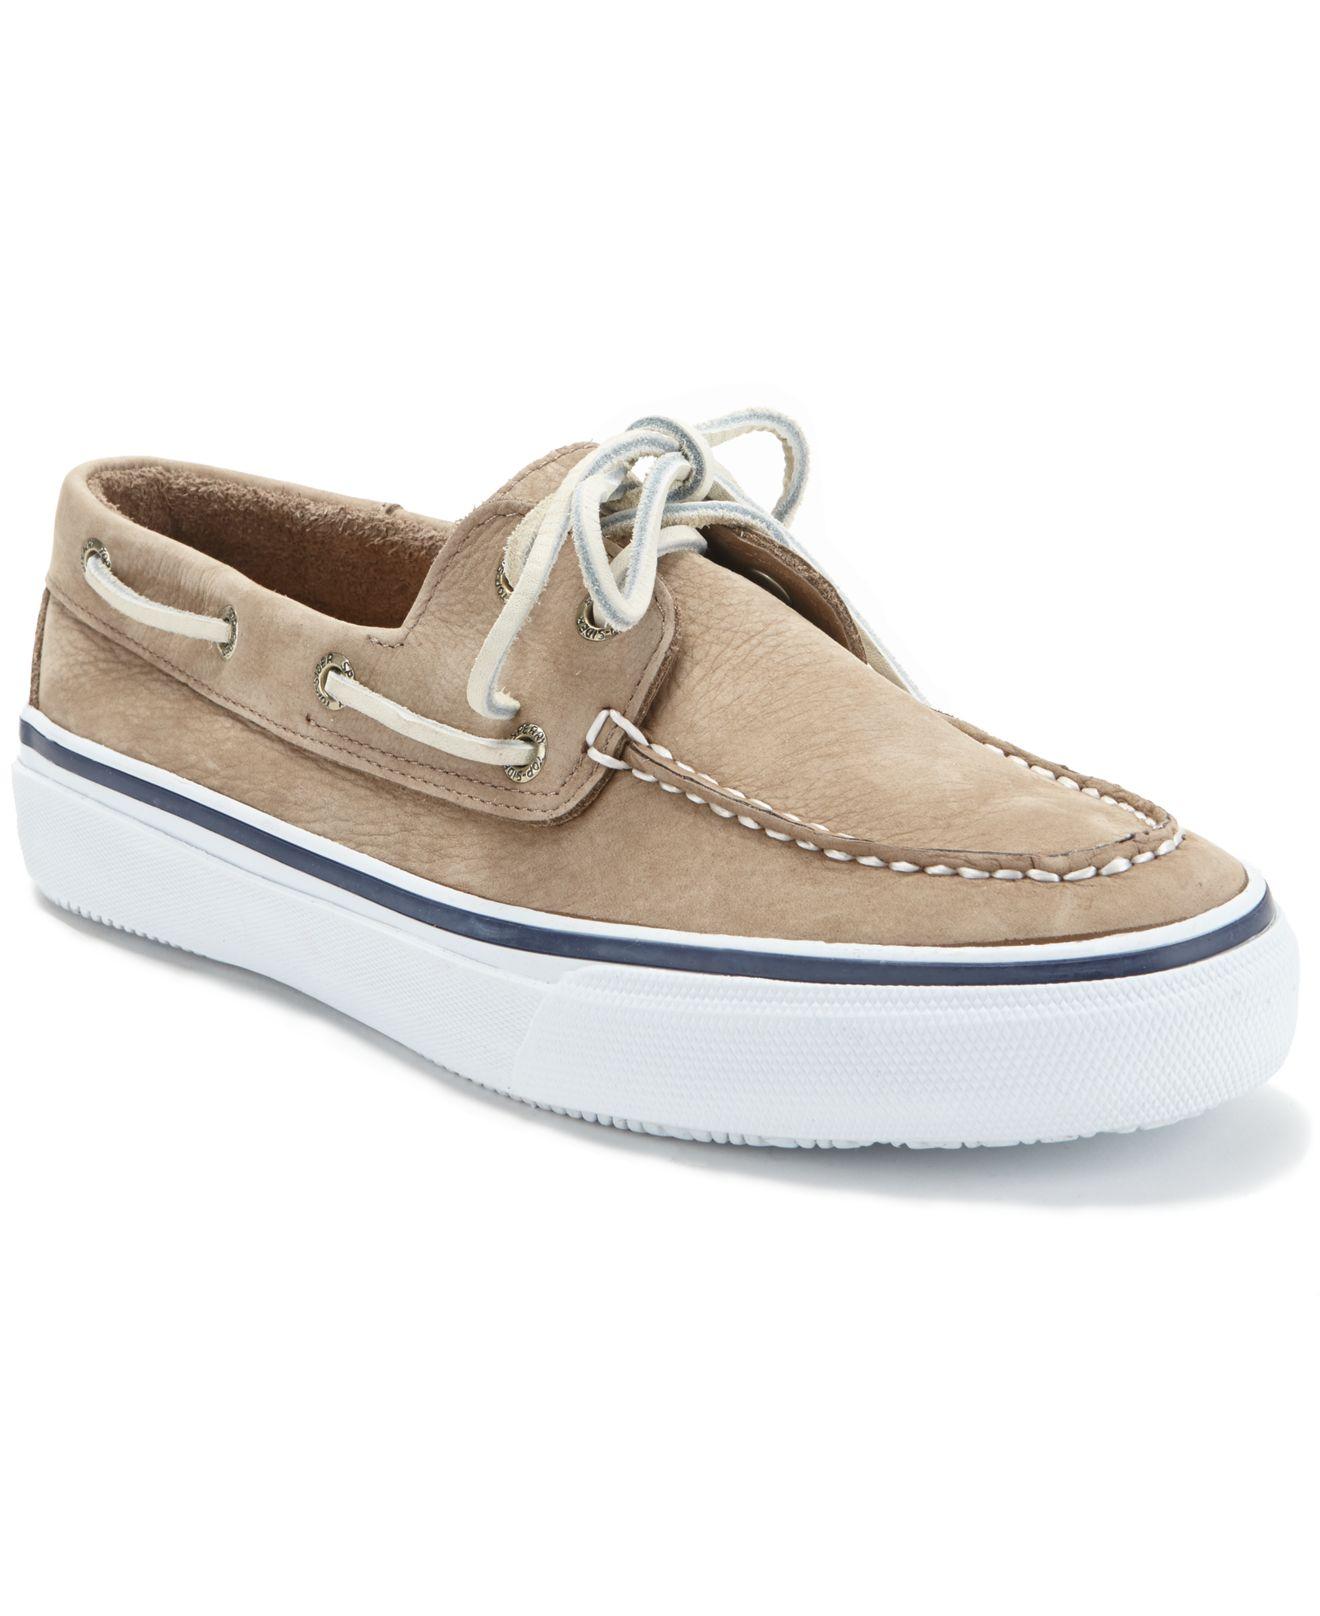 E Men S Boat Shoes Cheap